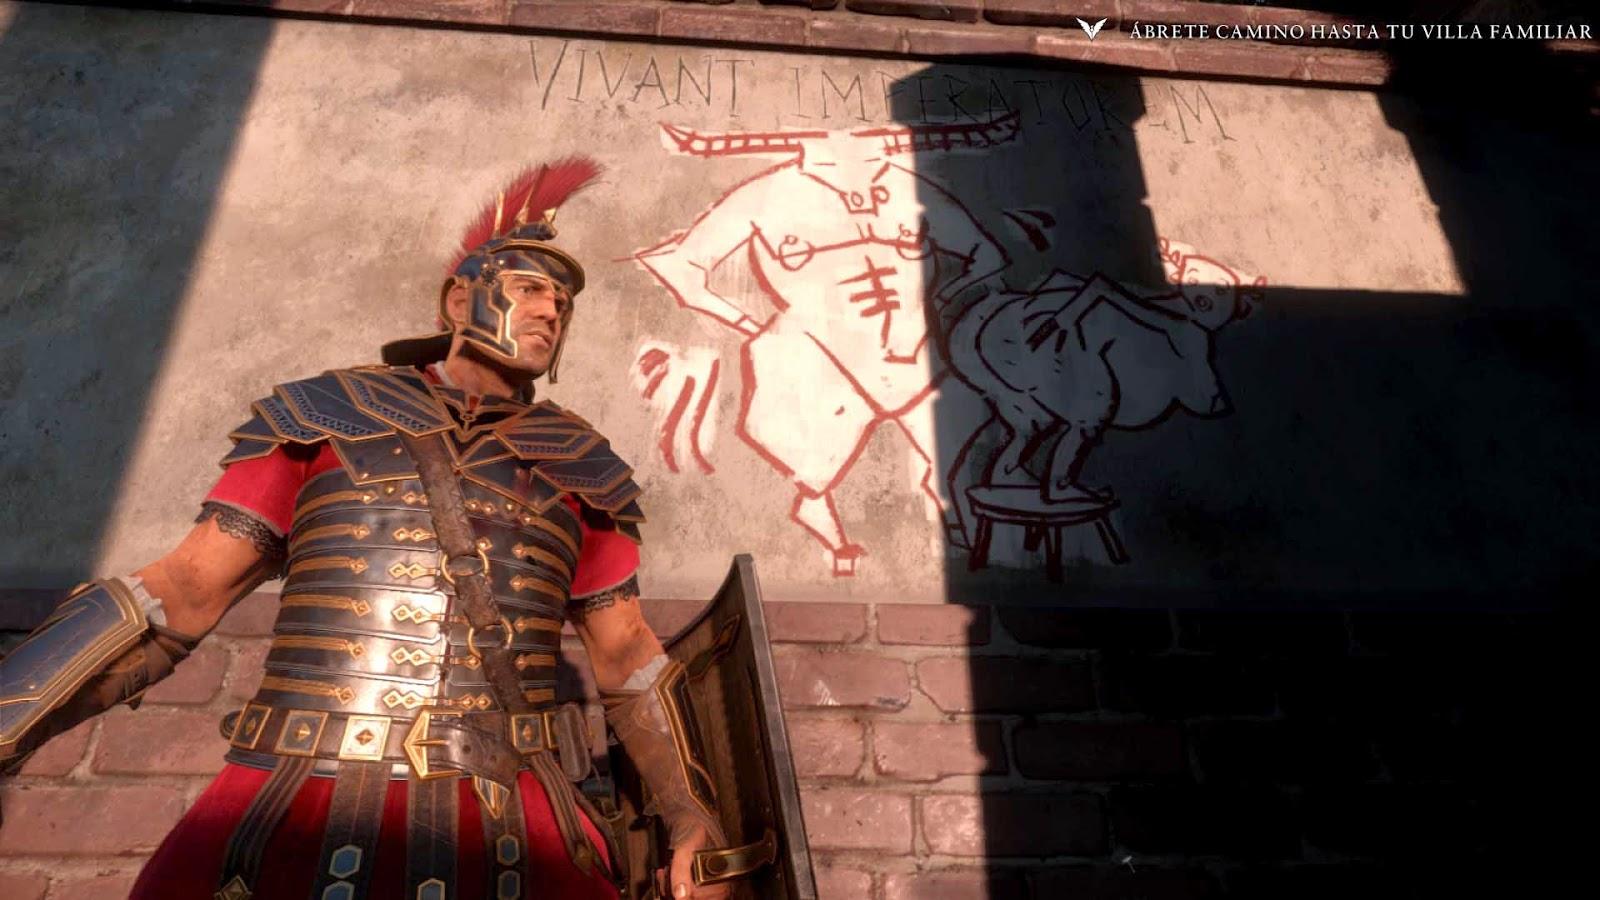 ryse son of rome pintada pared